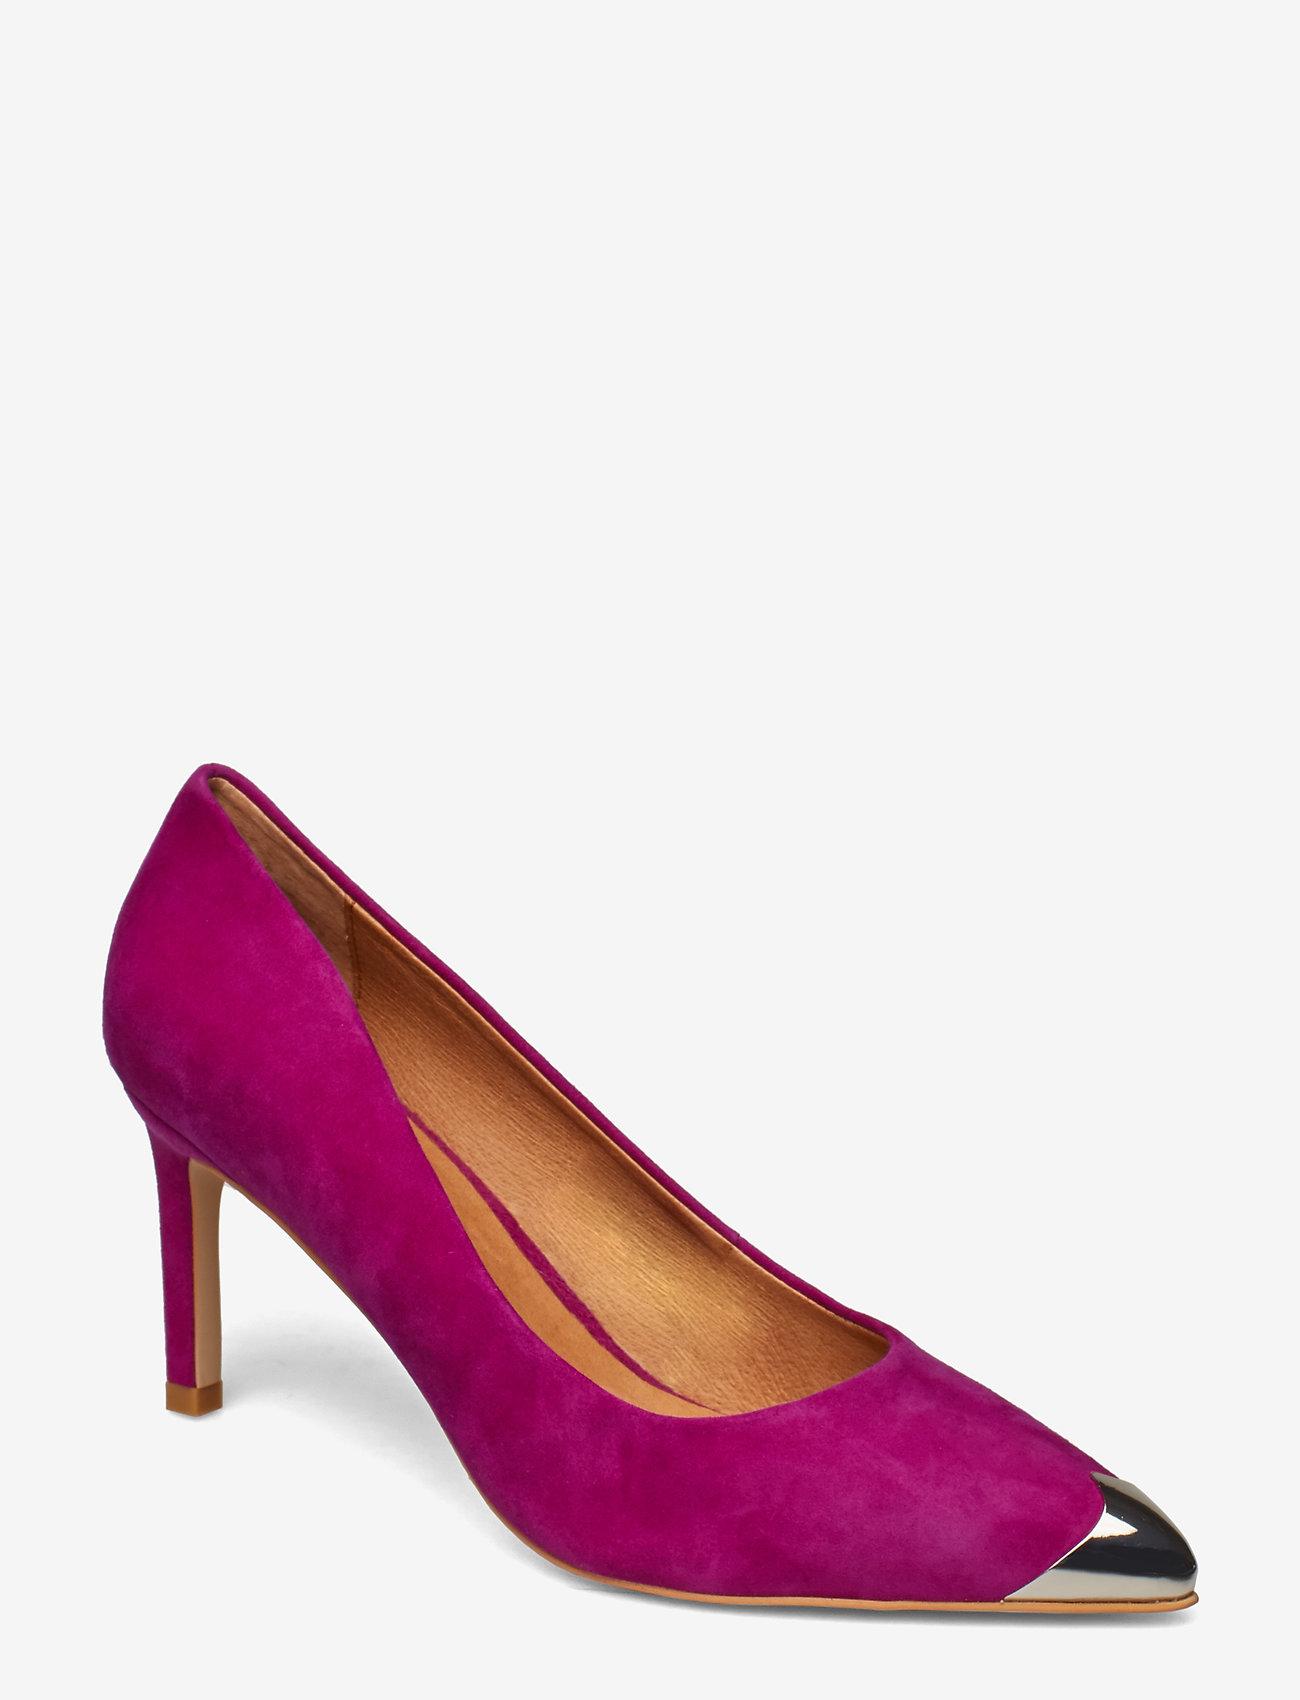 Shoe The Bear - CORA METAL TOE S - klassiset piikkikorkokengät - purple